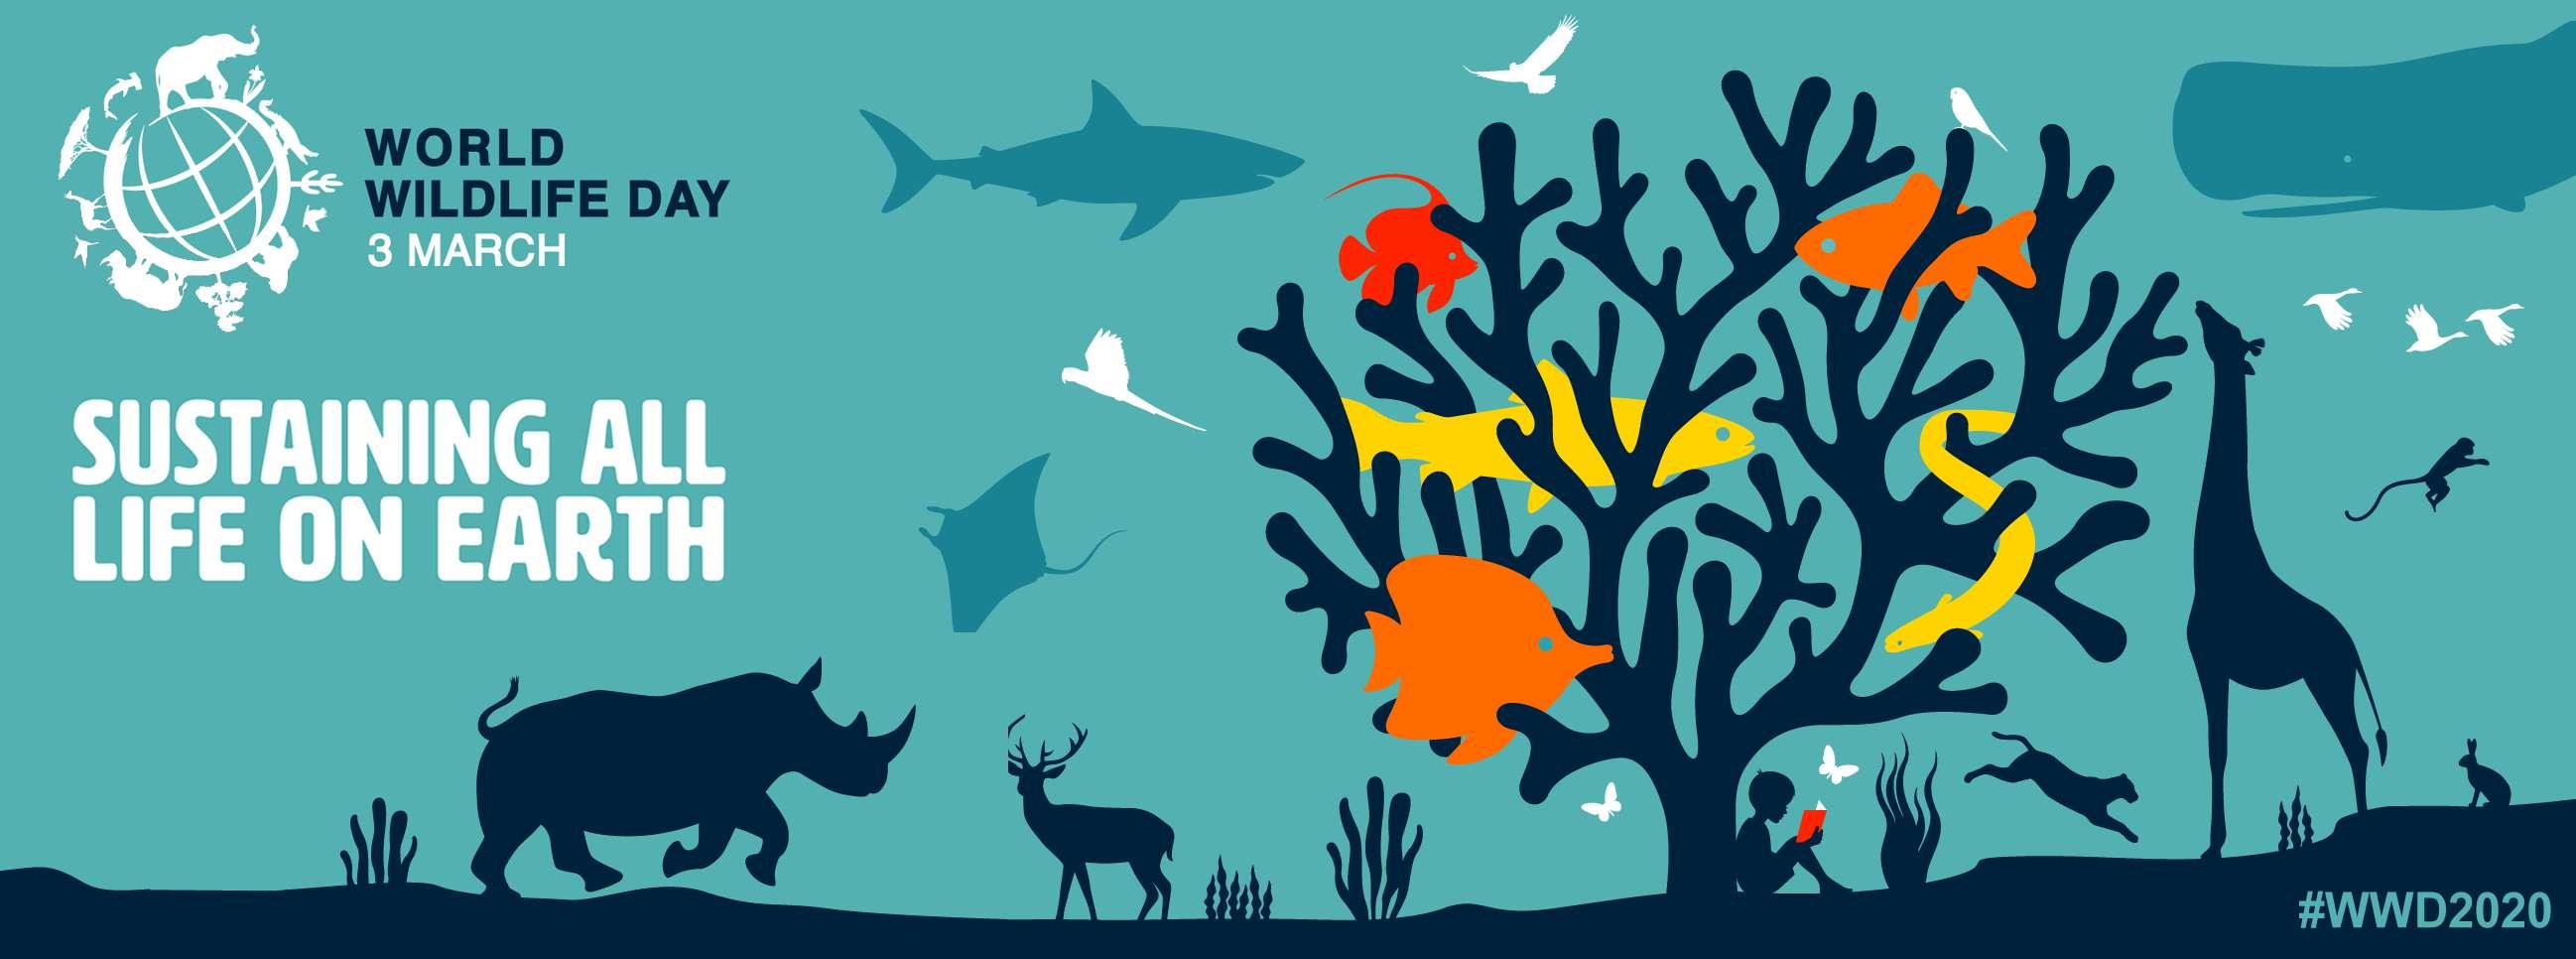 World Wildlife Day Wishes Sweet Images